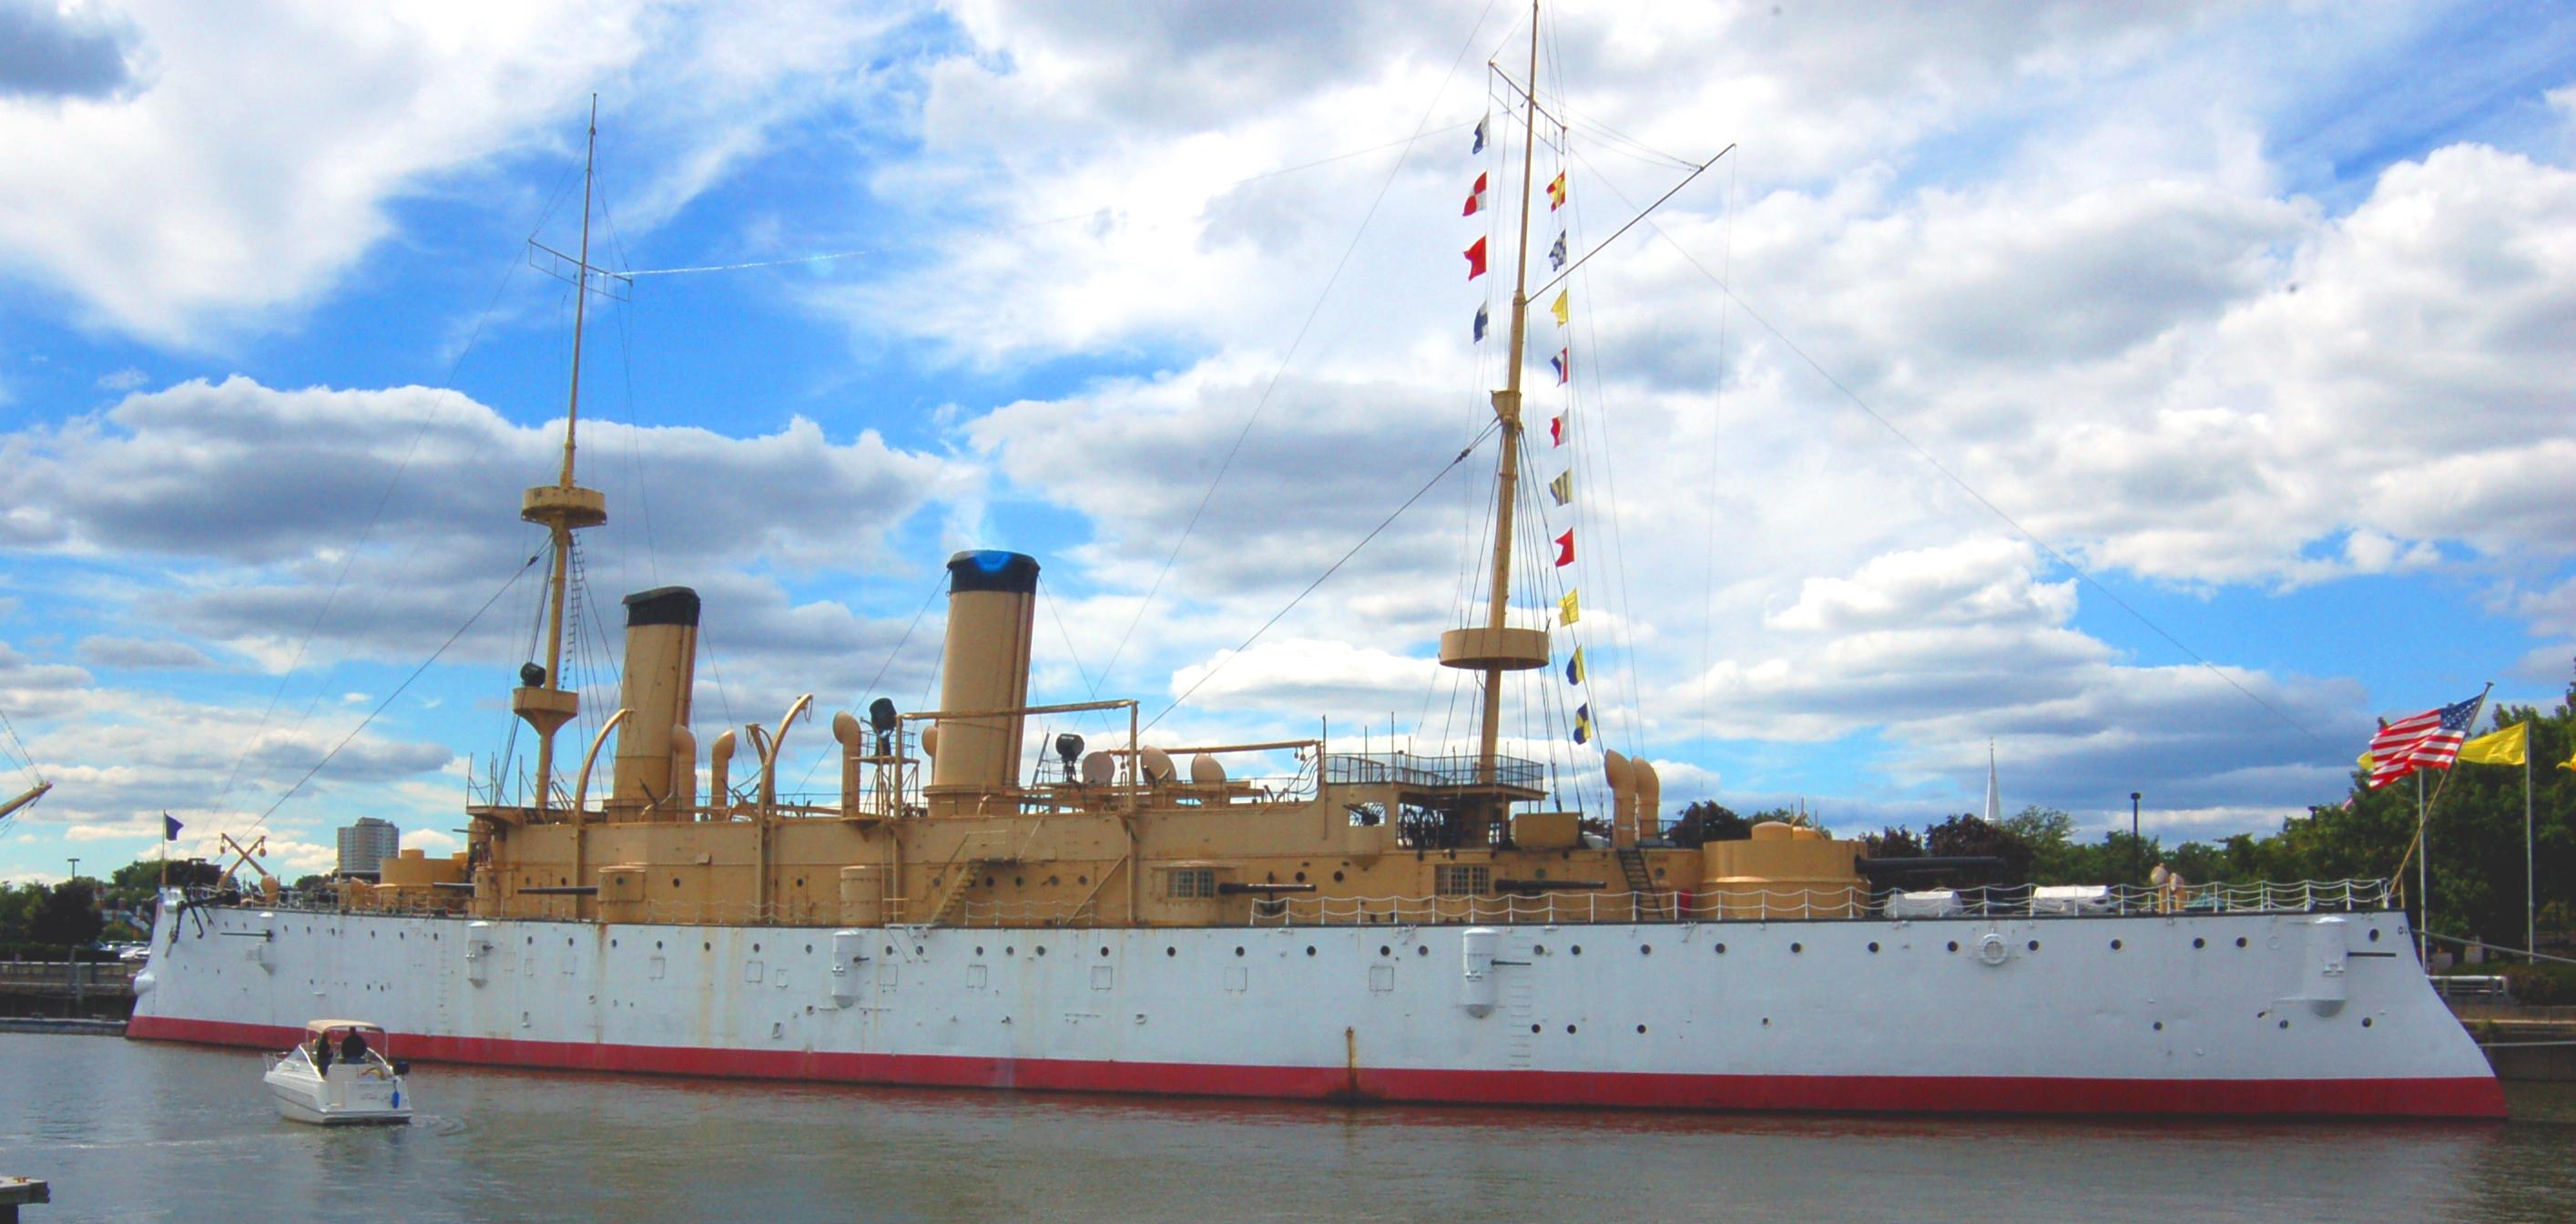 https://upload.wikimedia.org/wikipedia/commons/5/5b/USS_Olympia_2.jpg